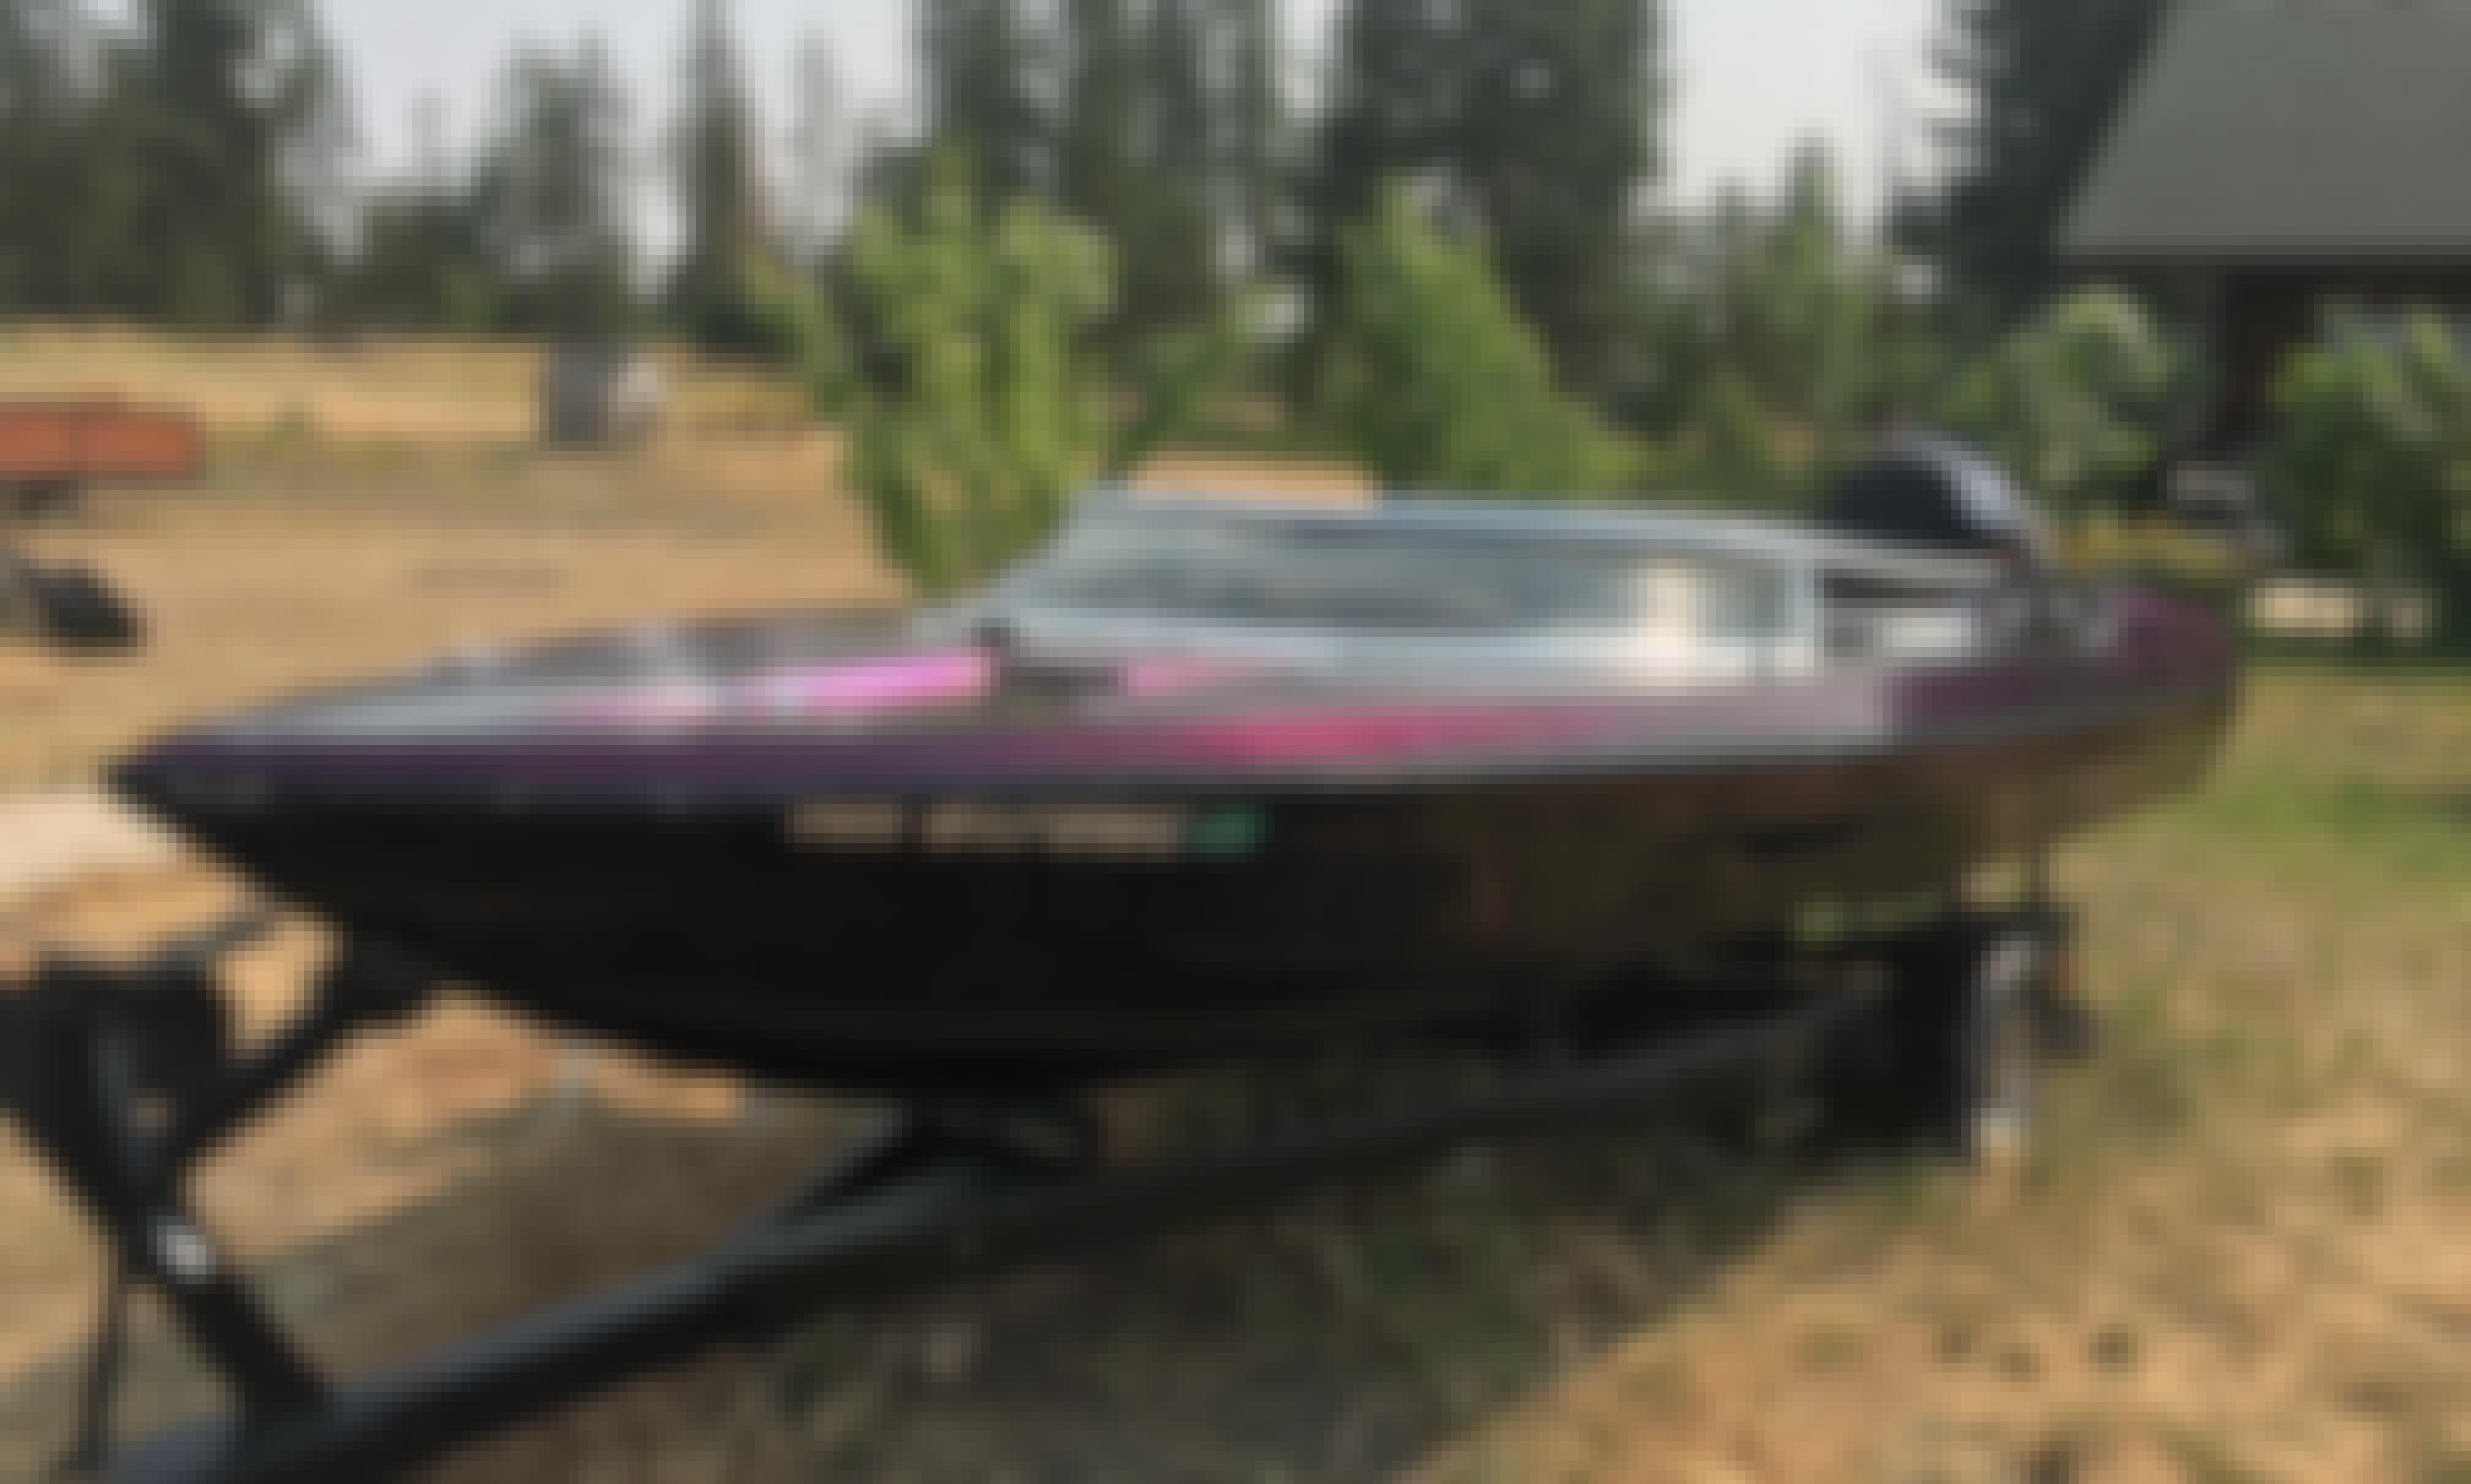 Bowrider Boat Rental in Spokane, Washington